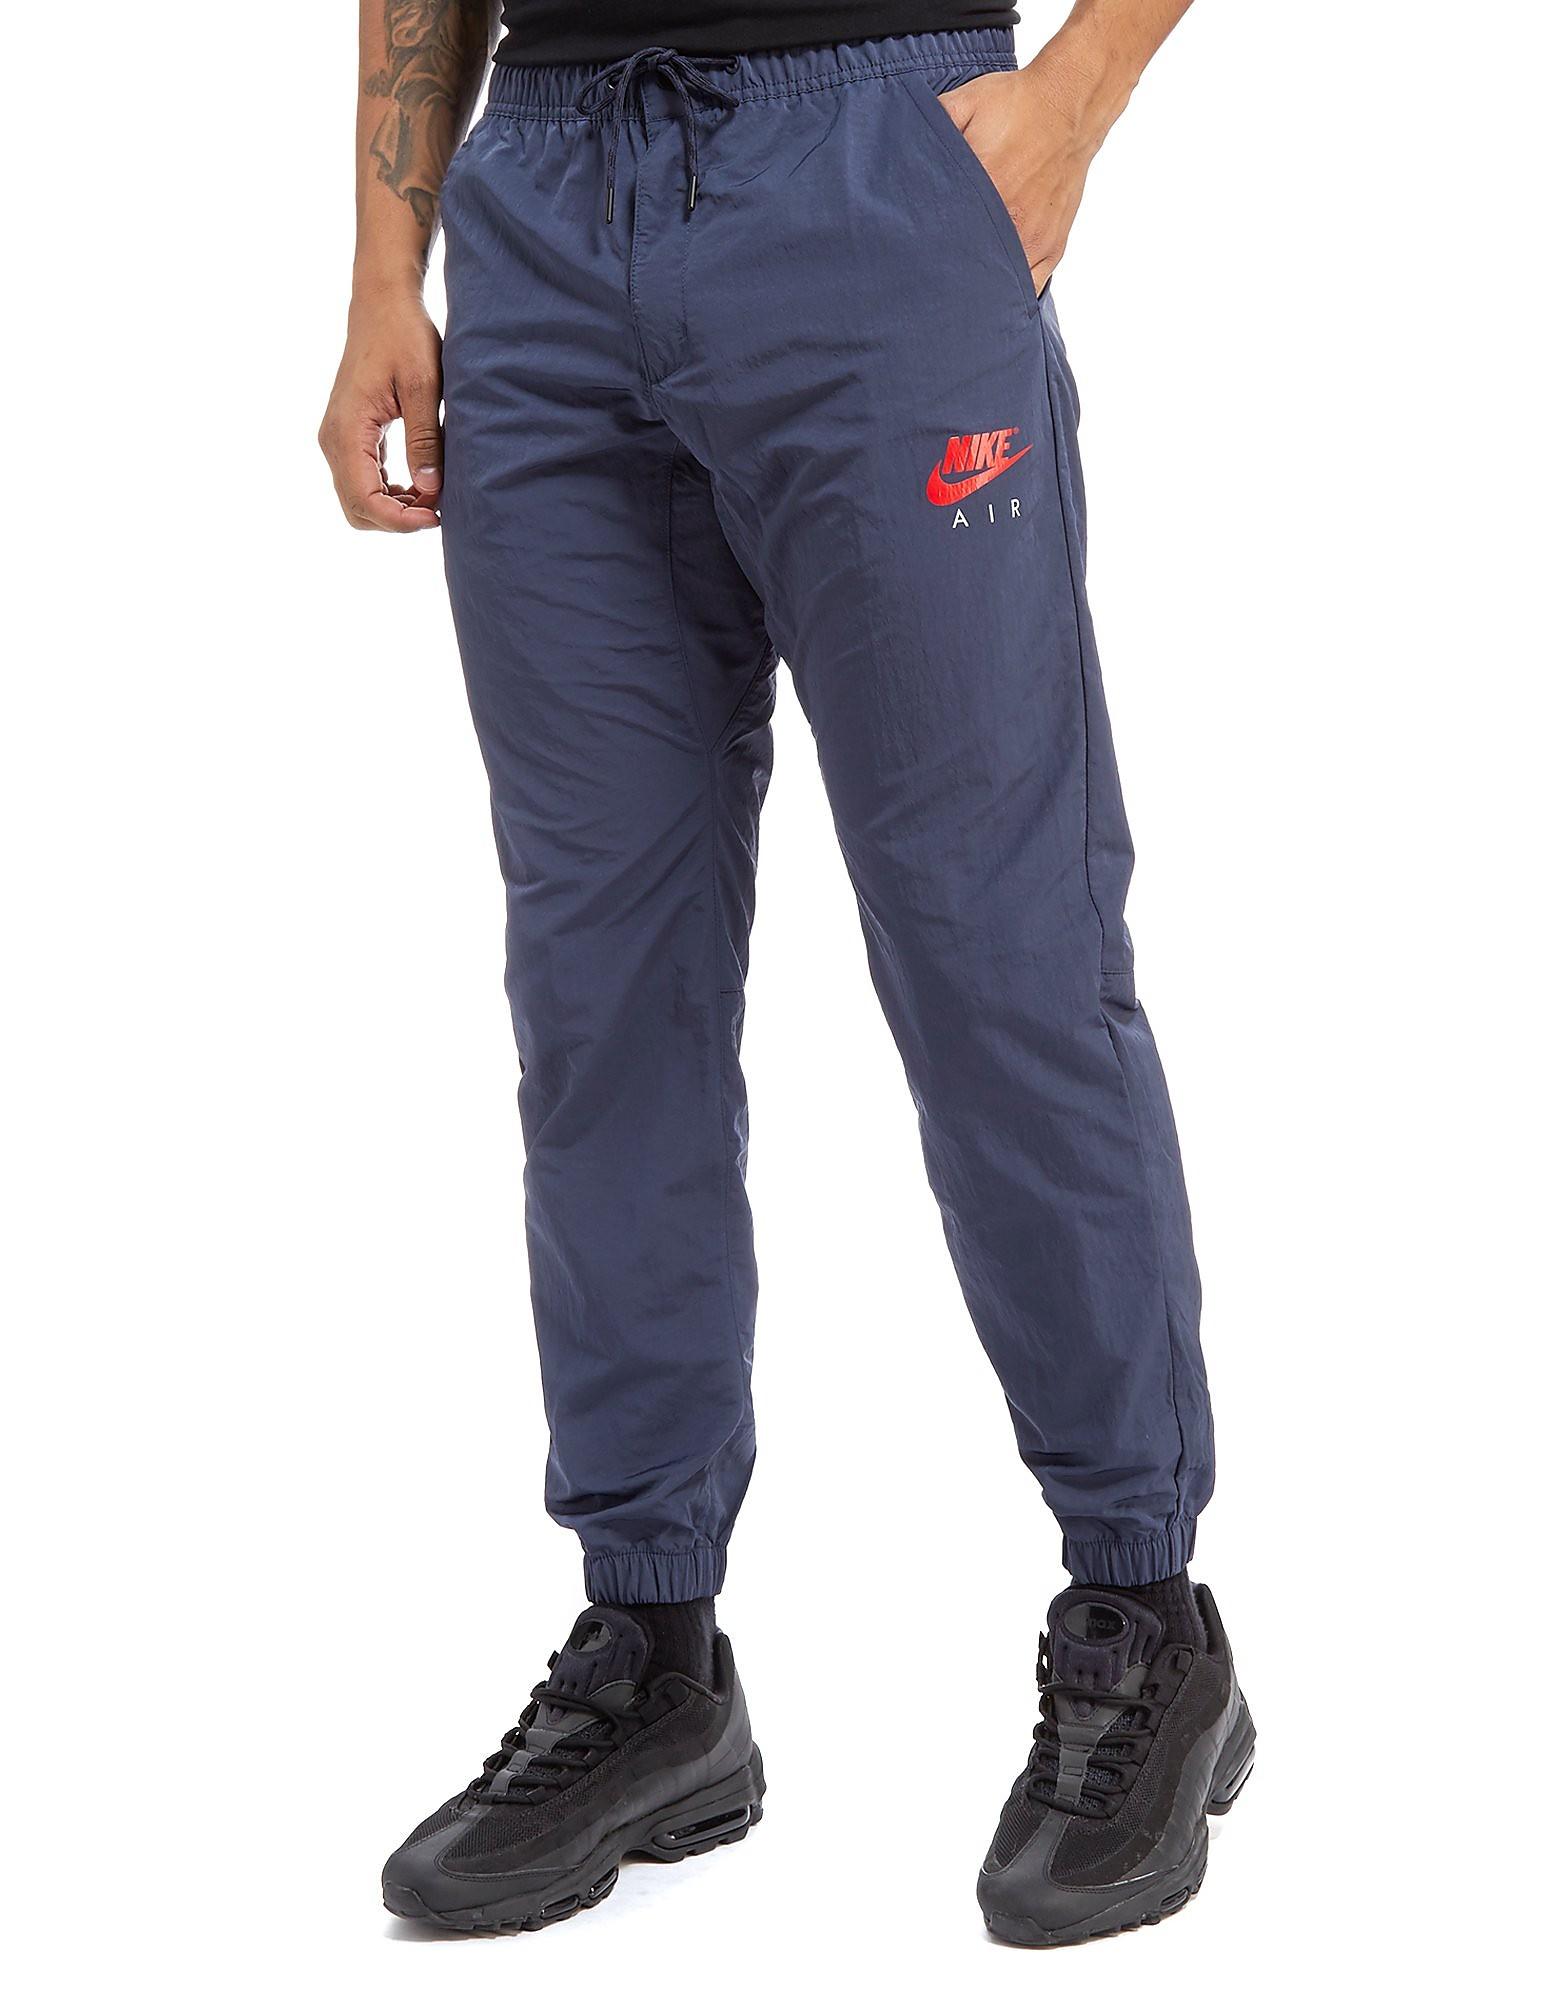 Nike Pantalon Air Woven Homme